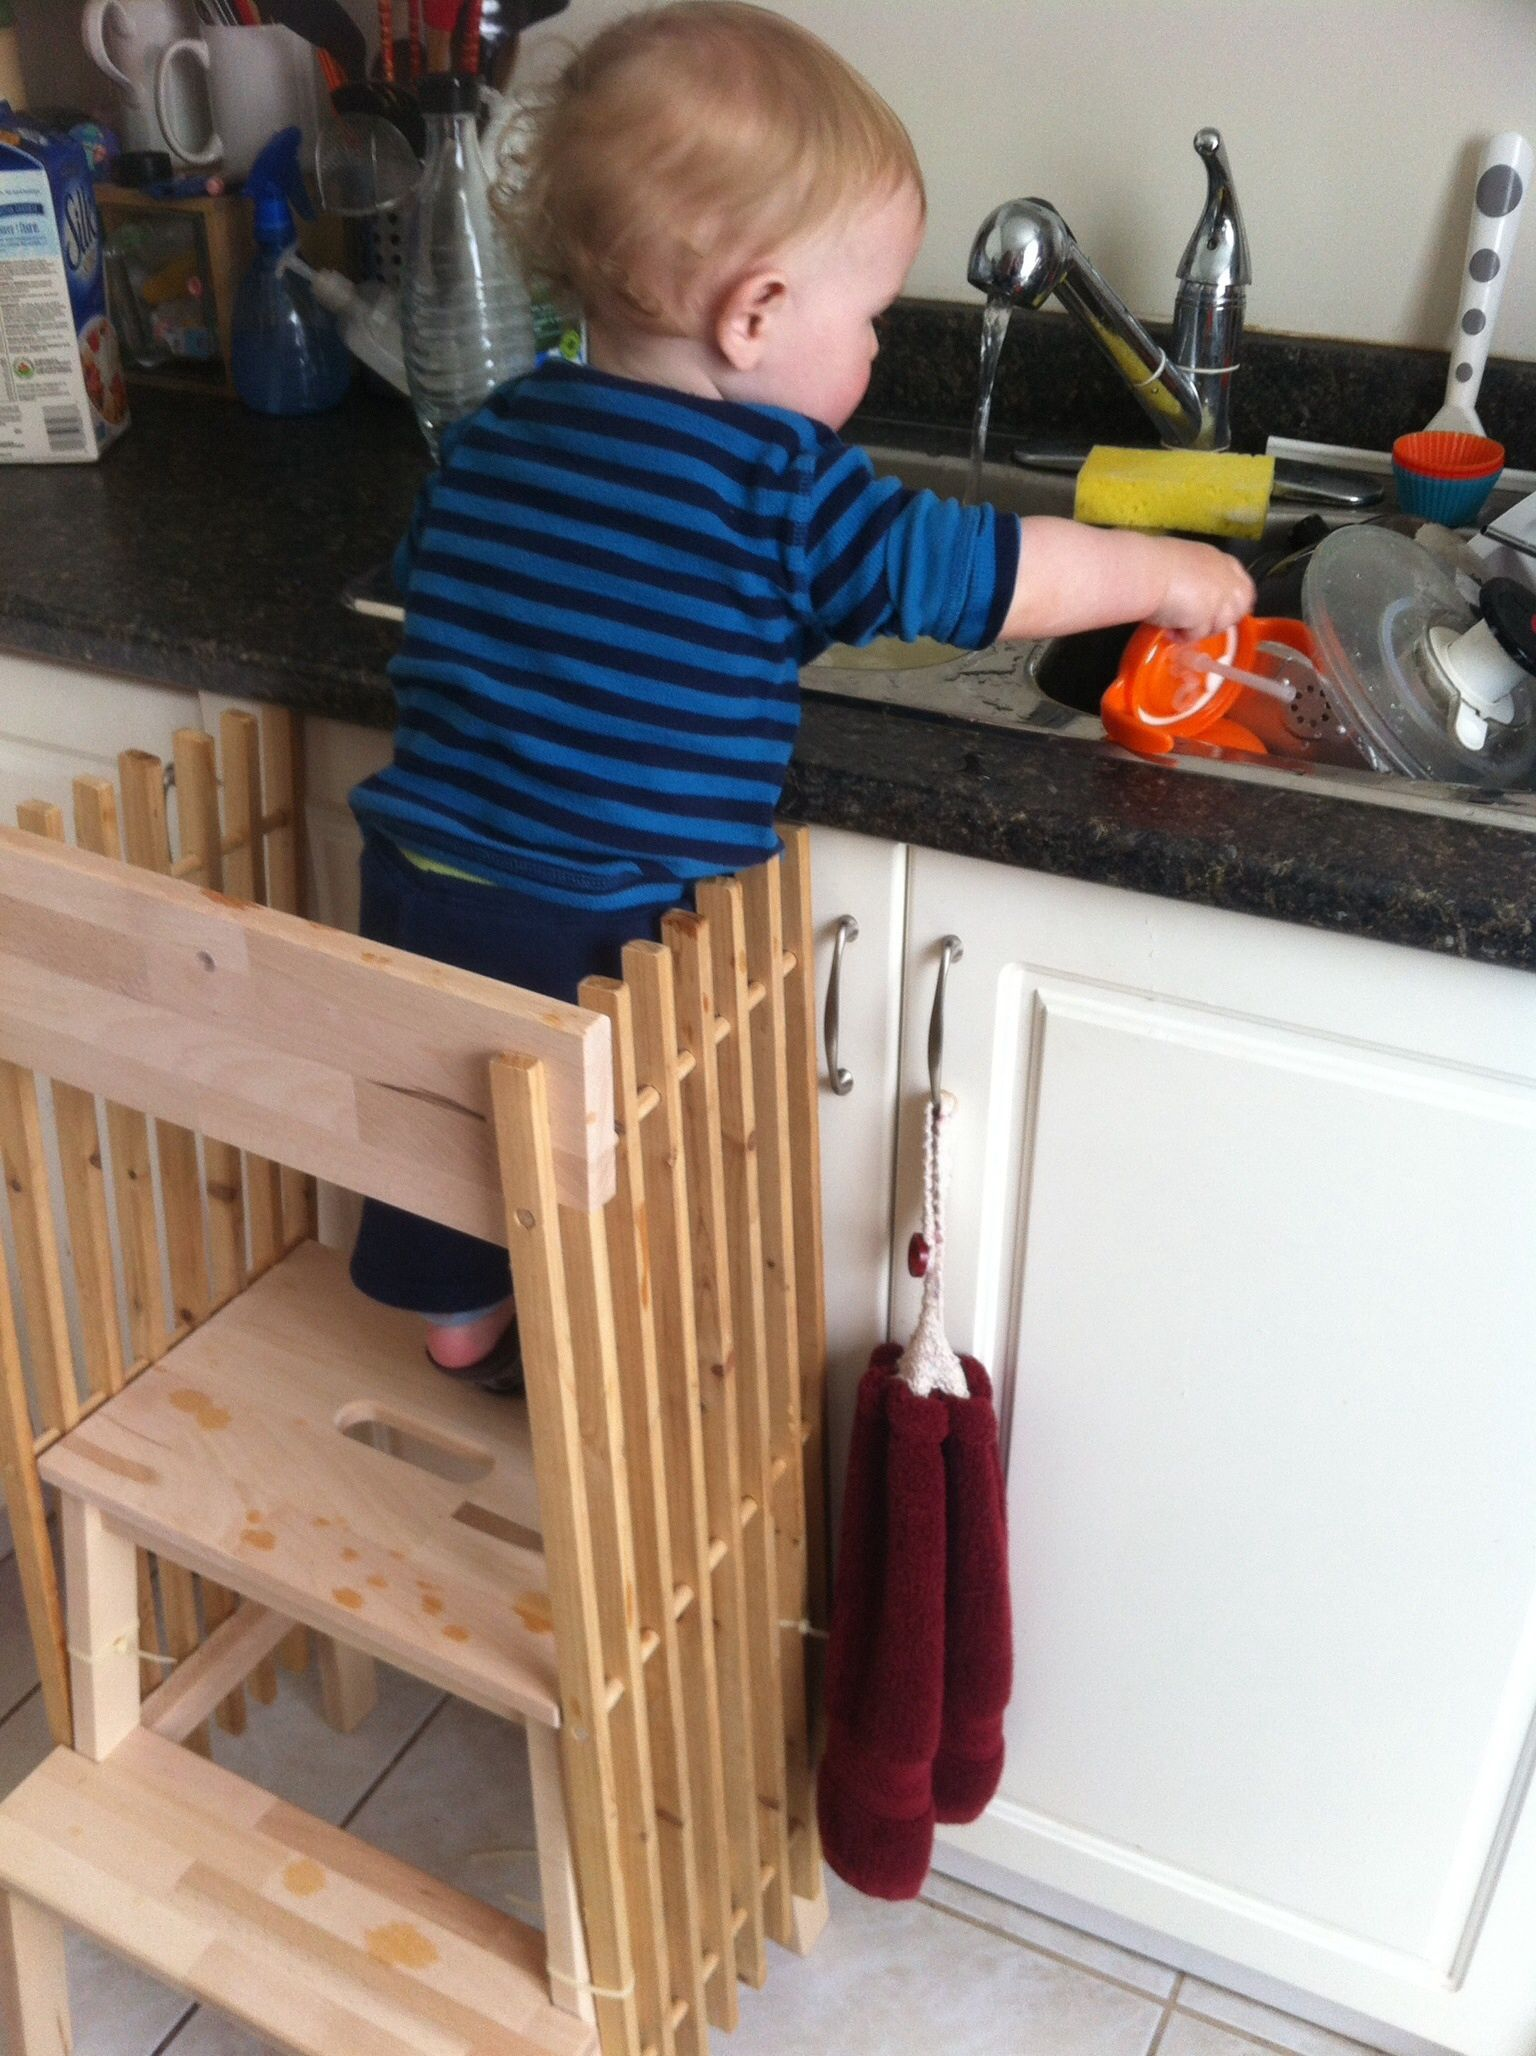 Ikea hack learning tower. One stool, one shoe rack, 4 zip